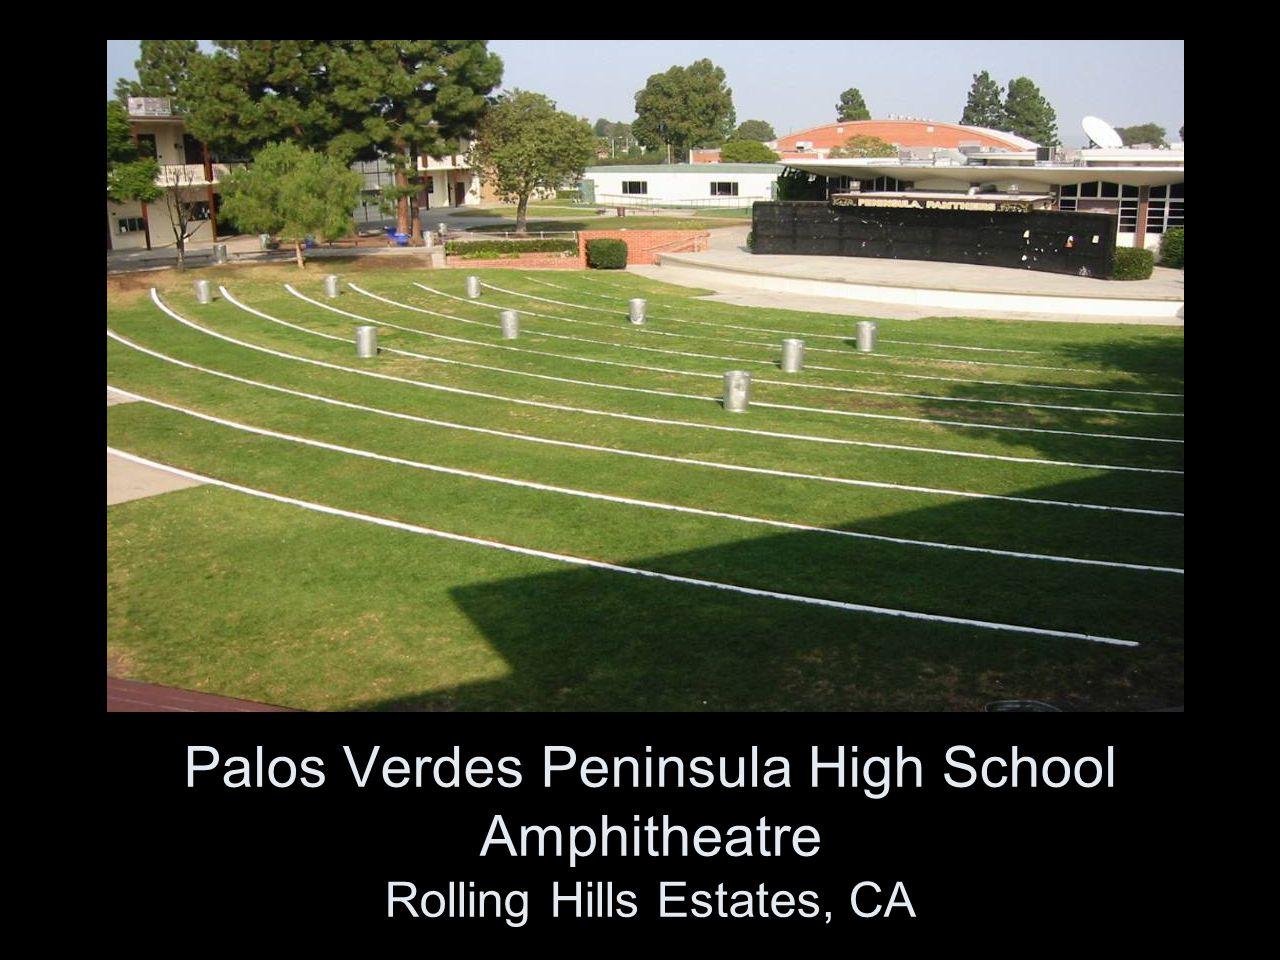 Palos Verdes Peninsula High School Amphitheatre Rolling Hills Estates, CA